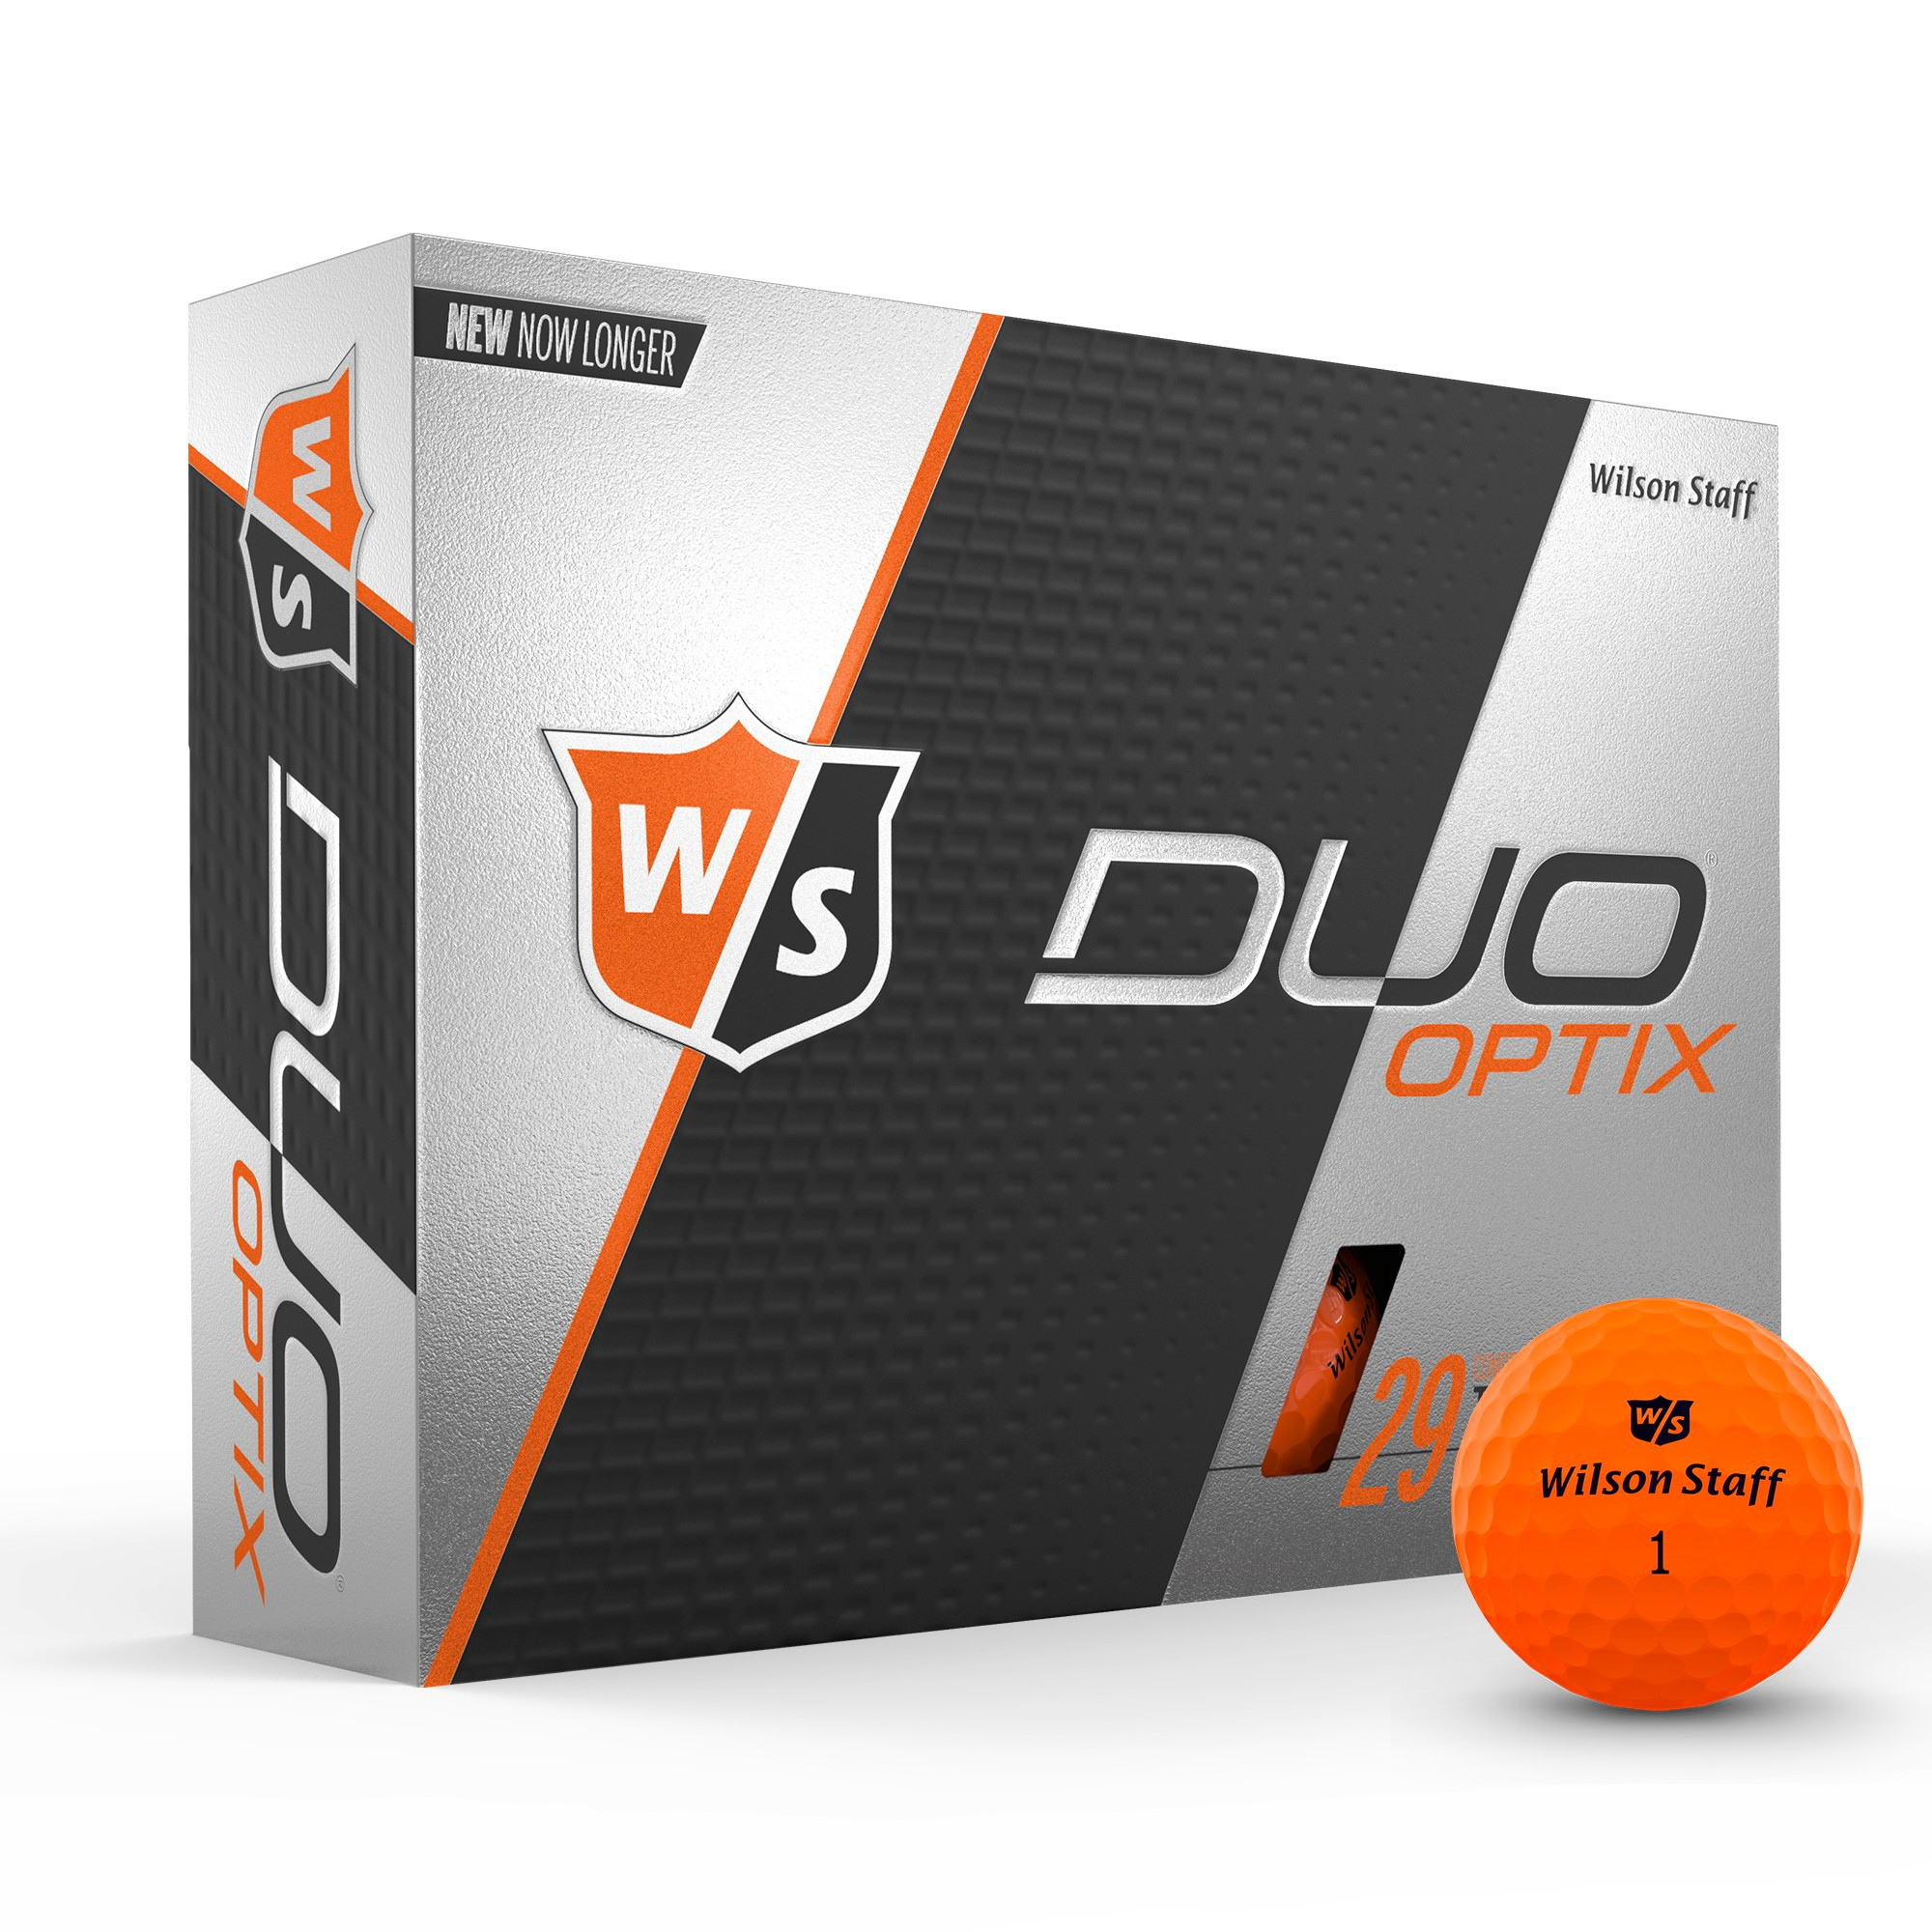 Wilson Staff Duo Soft Optix Golf Balls, Electric Glow Yellow, 12 pack by Wilson Sporting Goods